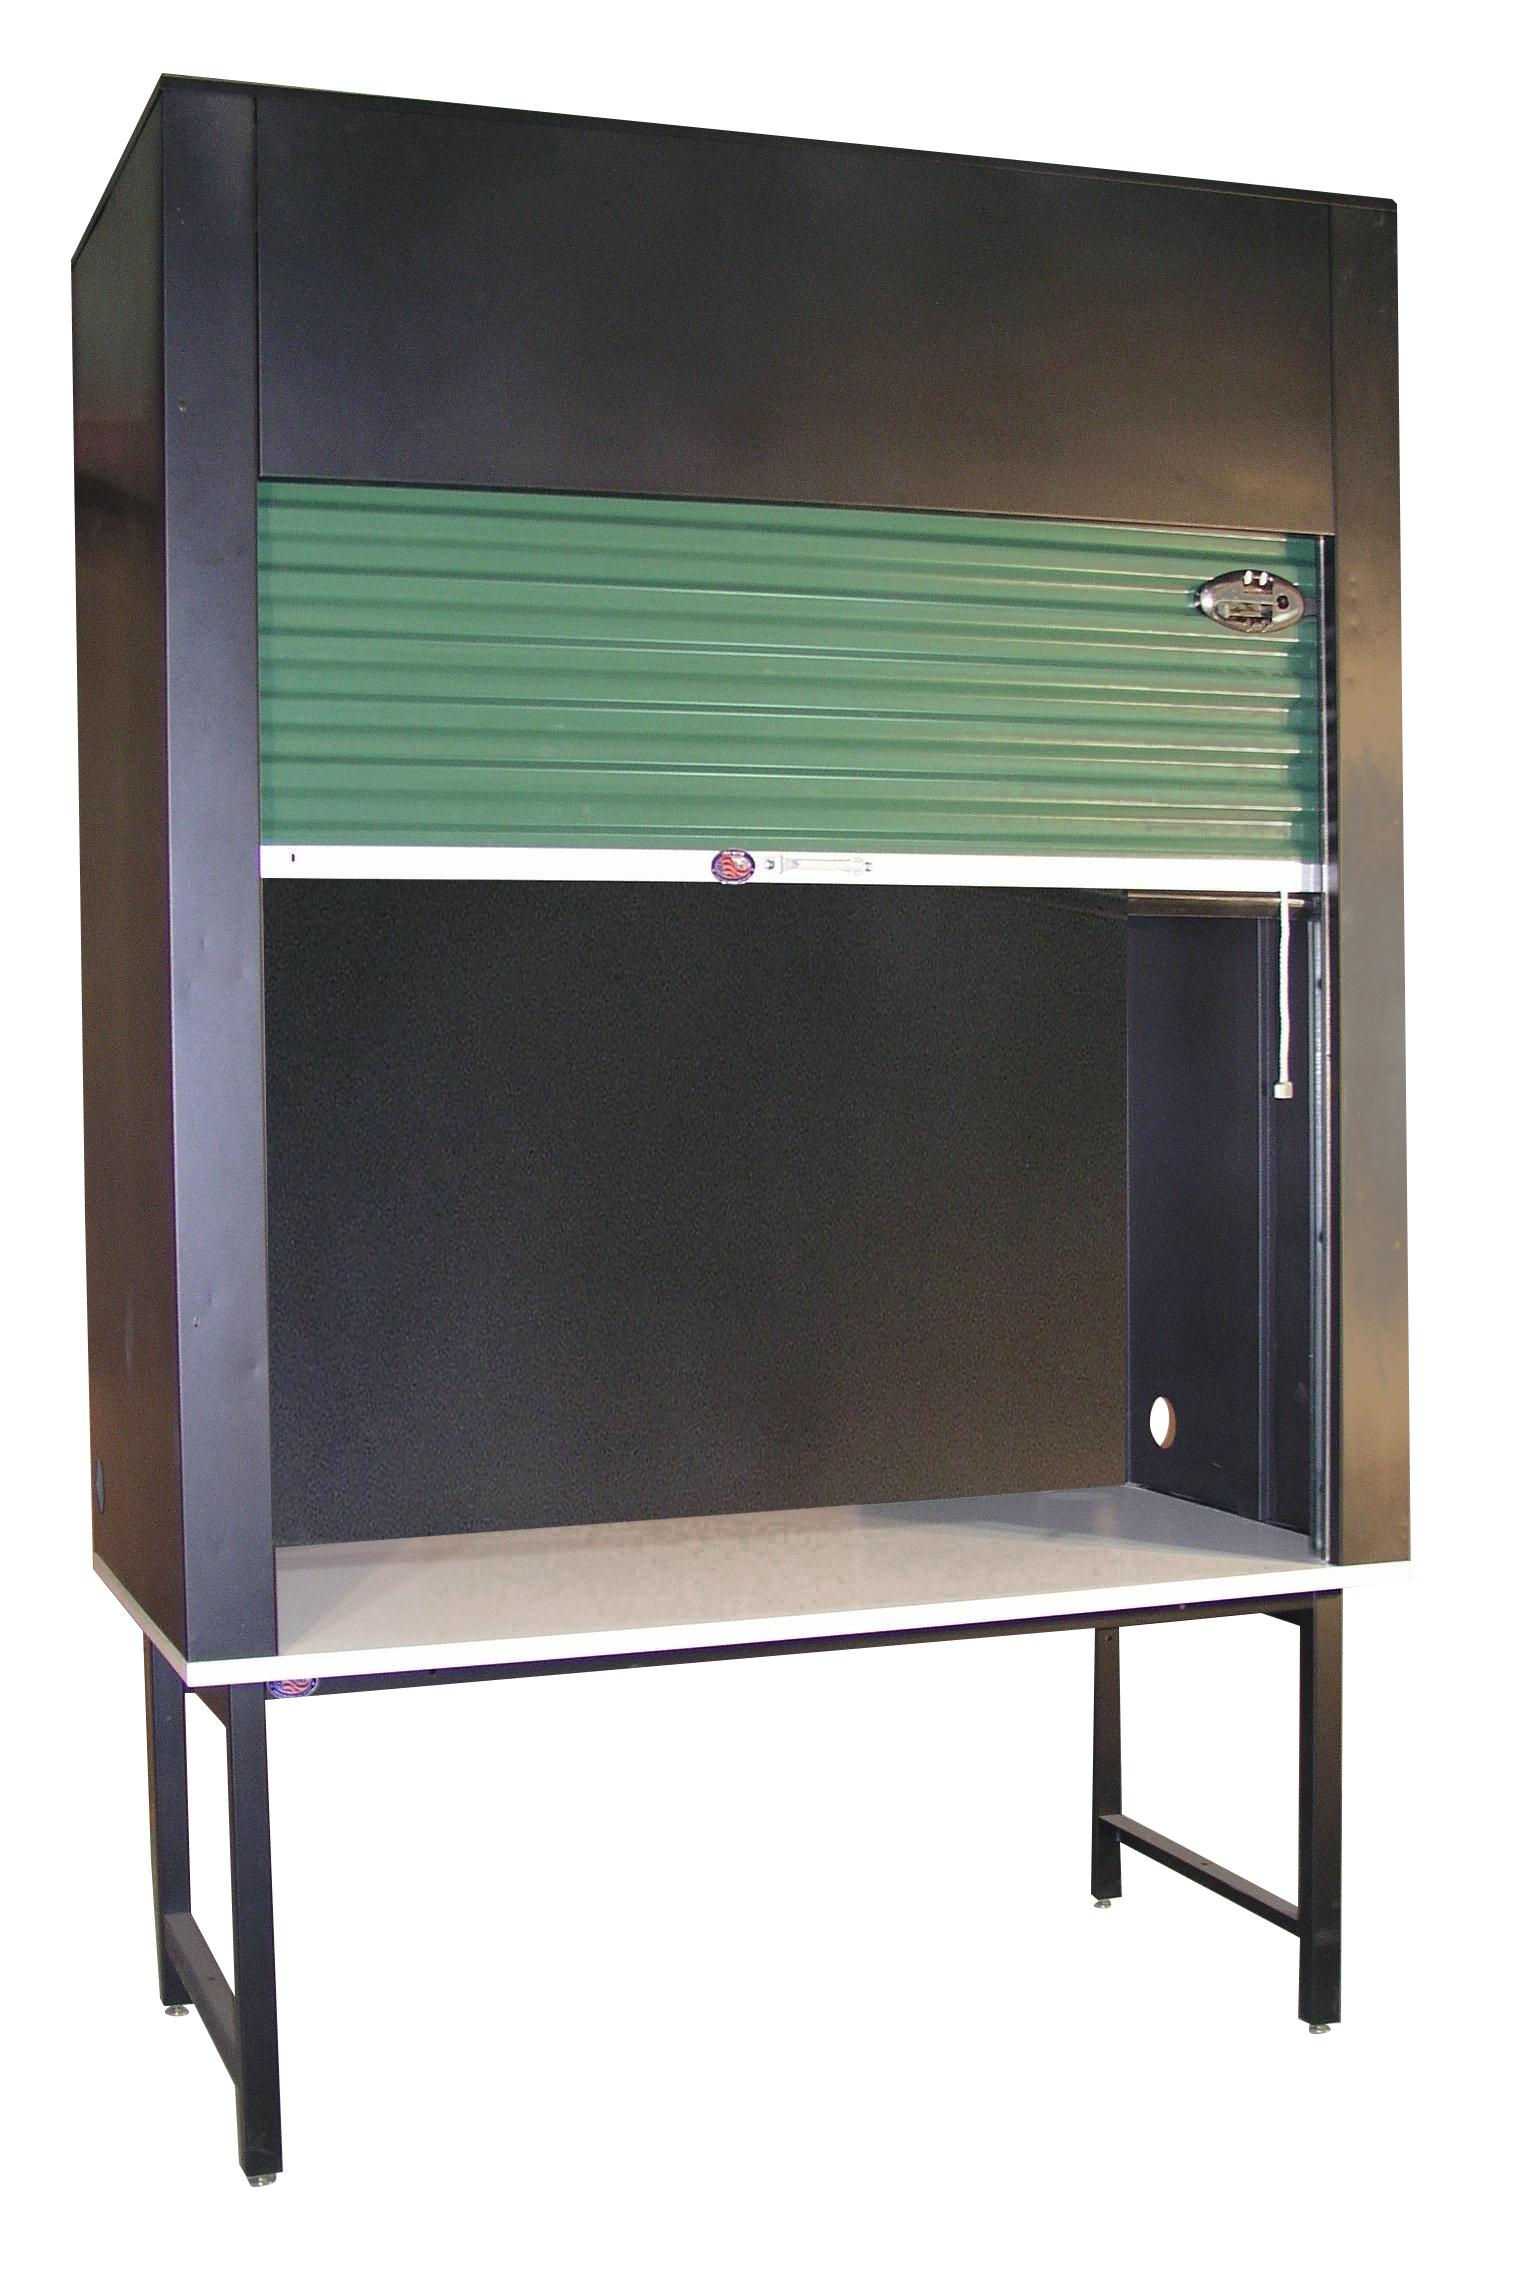 Enclosed storage workbench